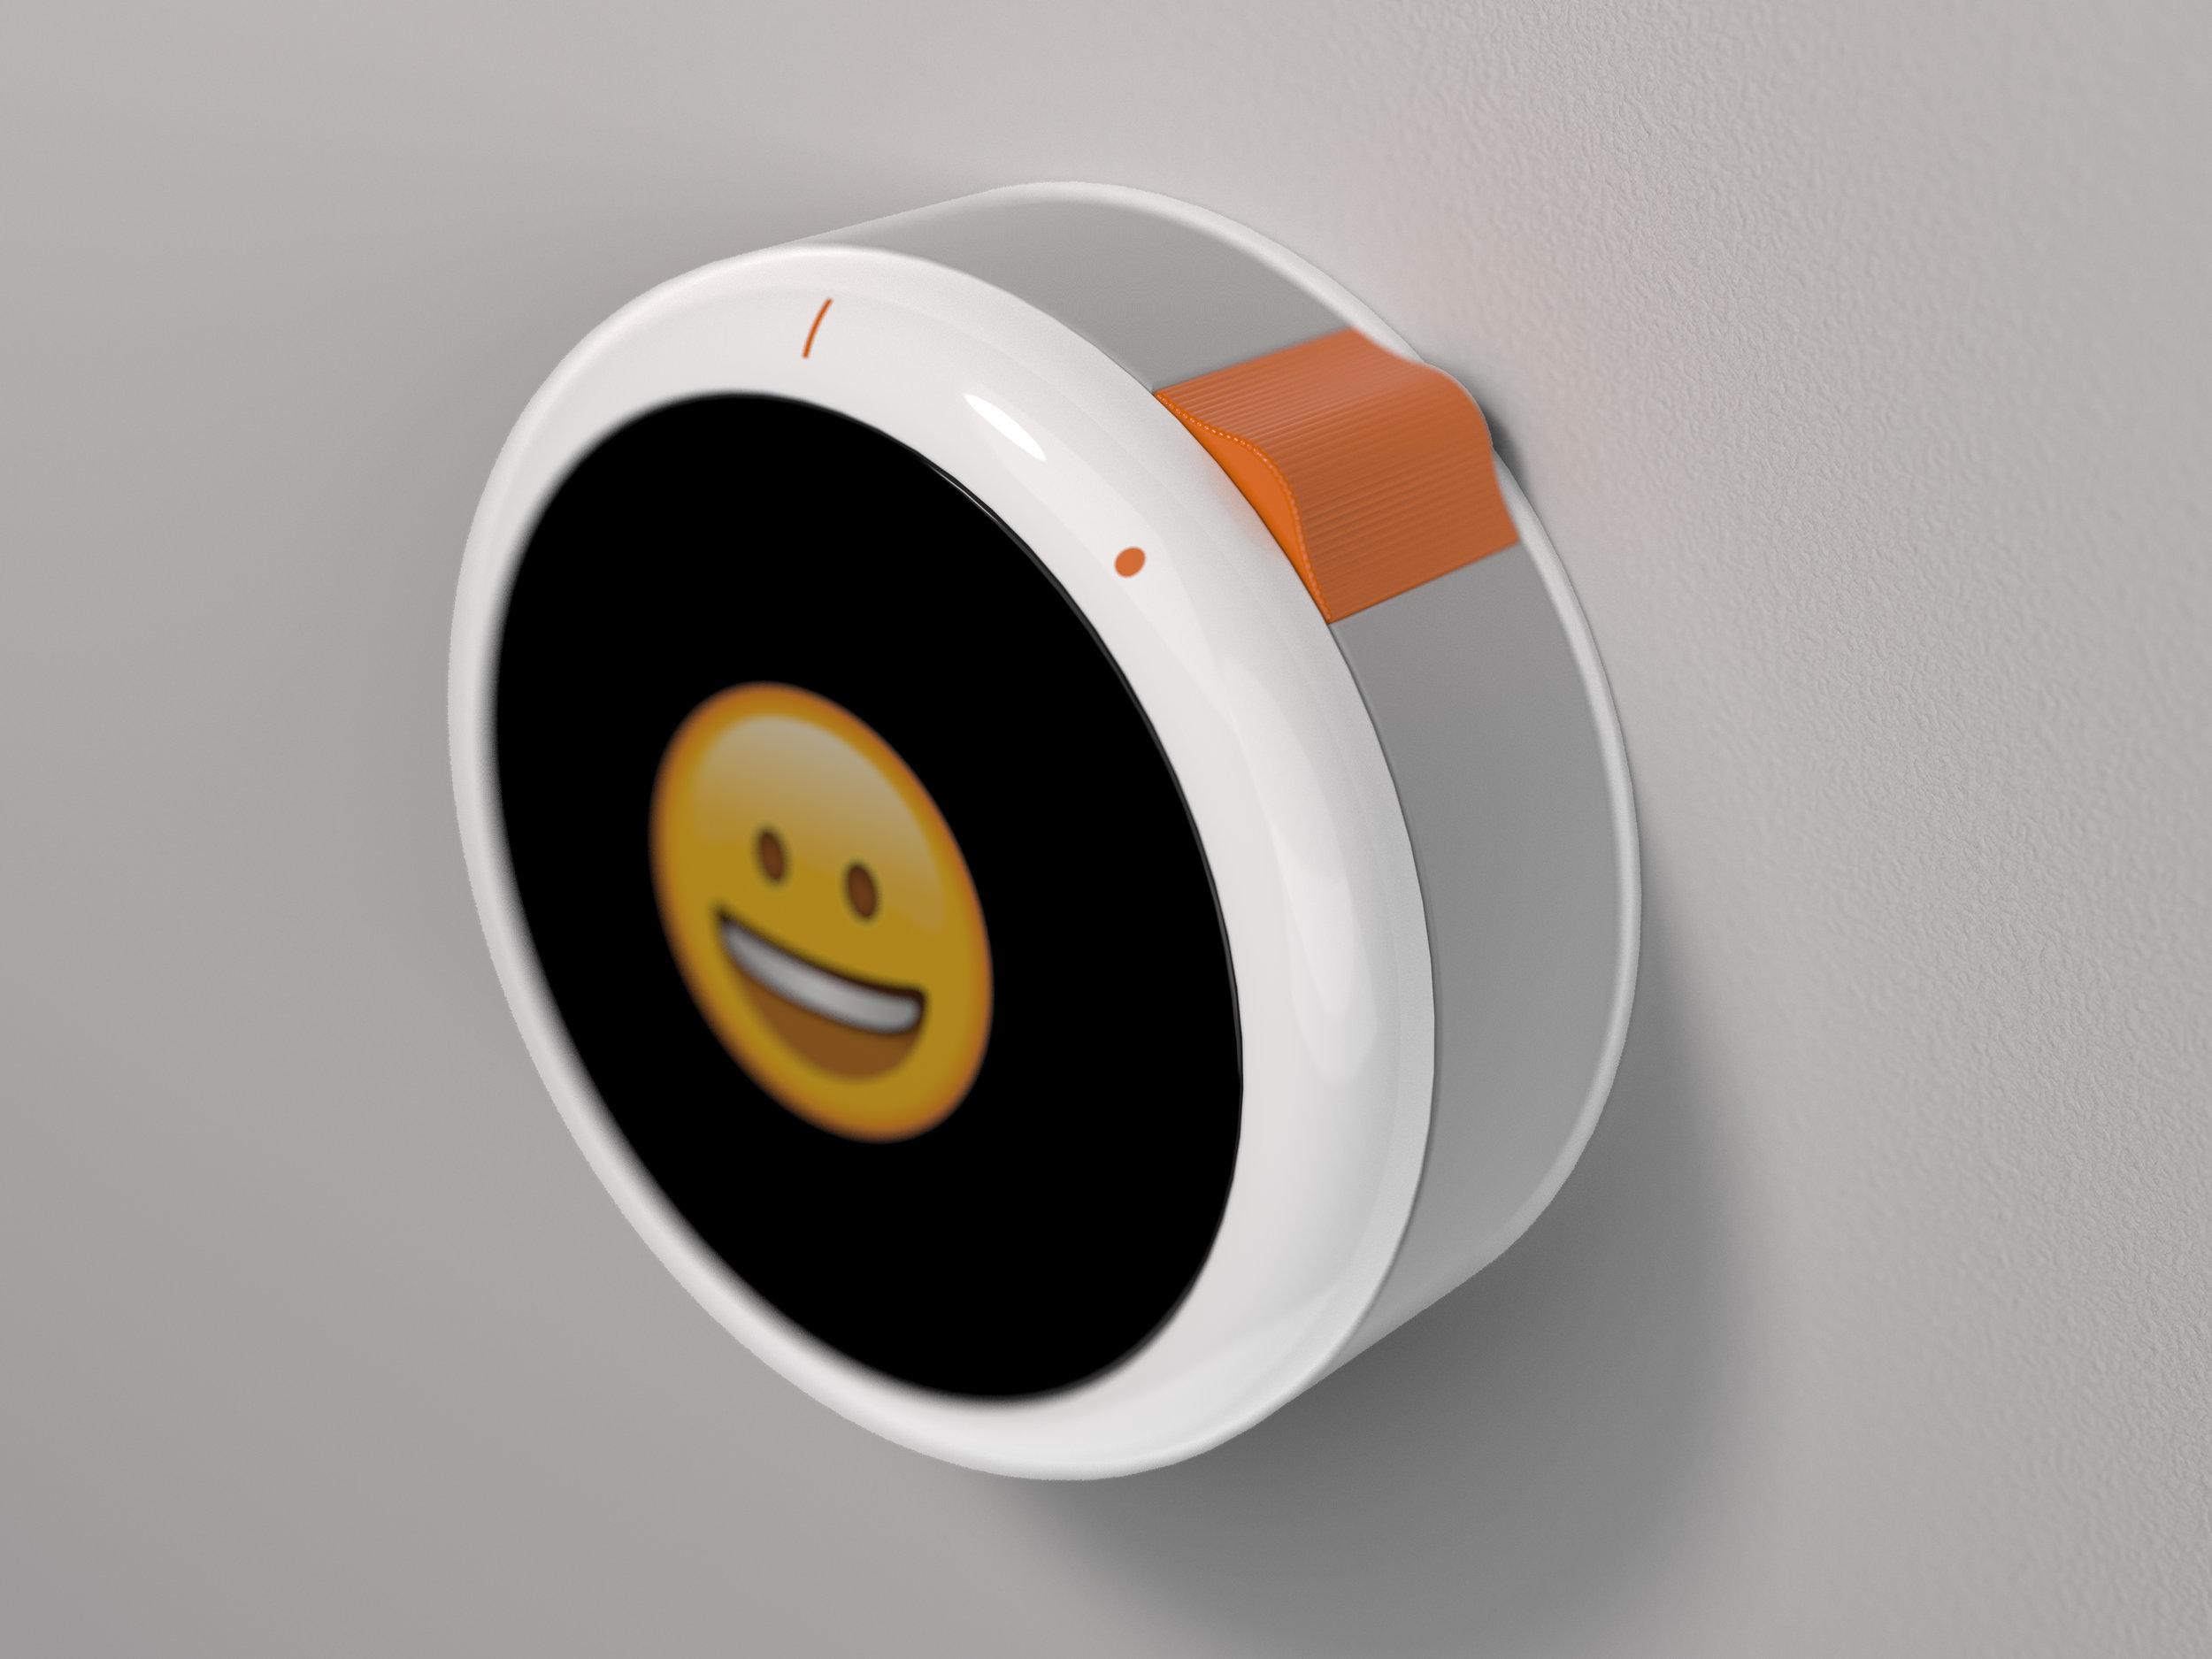 Smart Thermostat-Camera 3.46.jpg